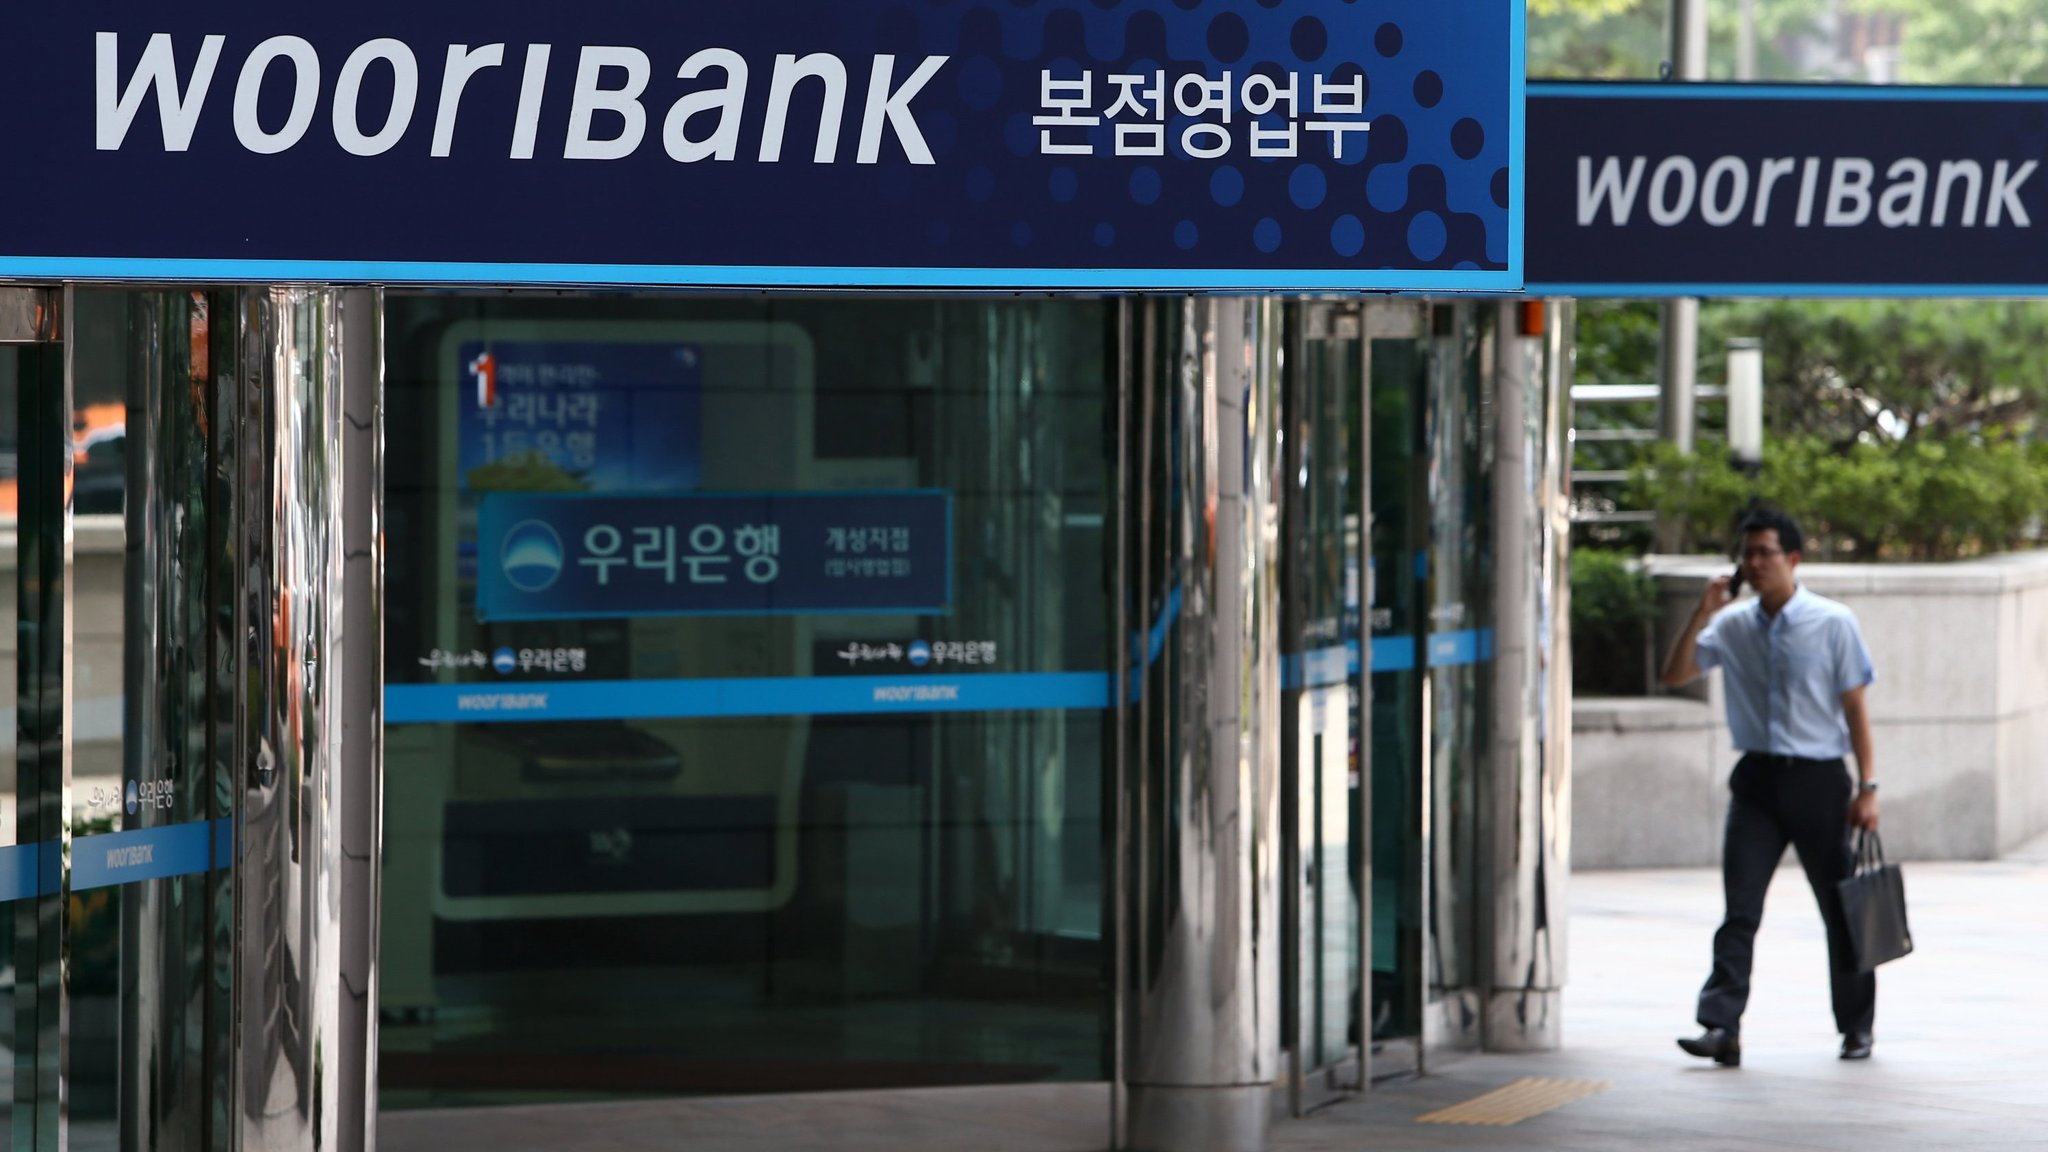 guney koreli woori bank kripto para sektorune giriyor